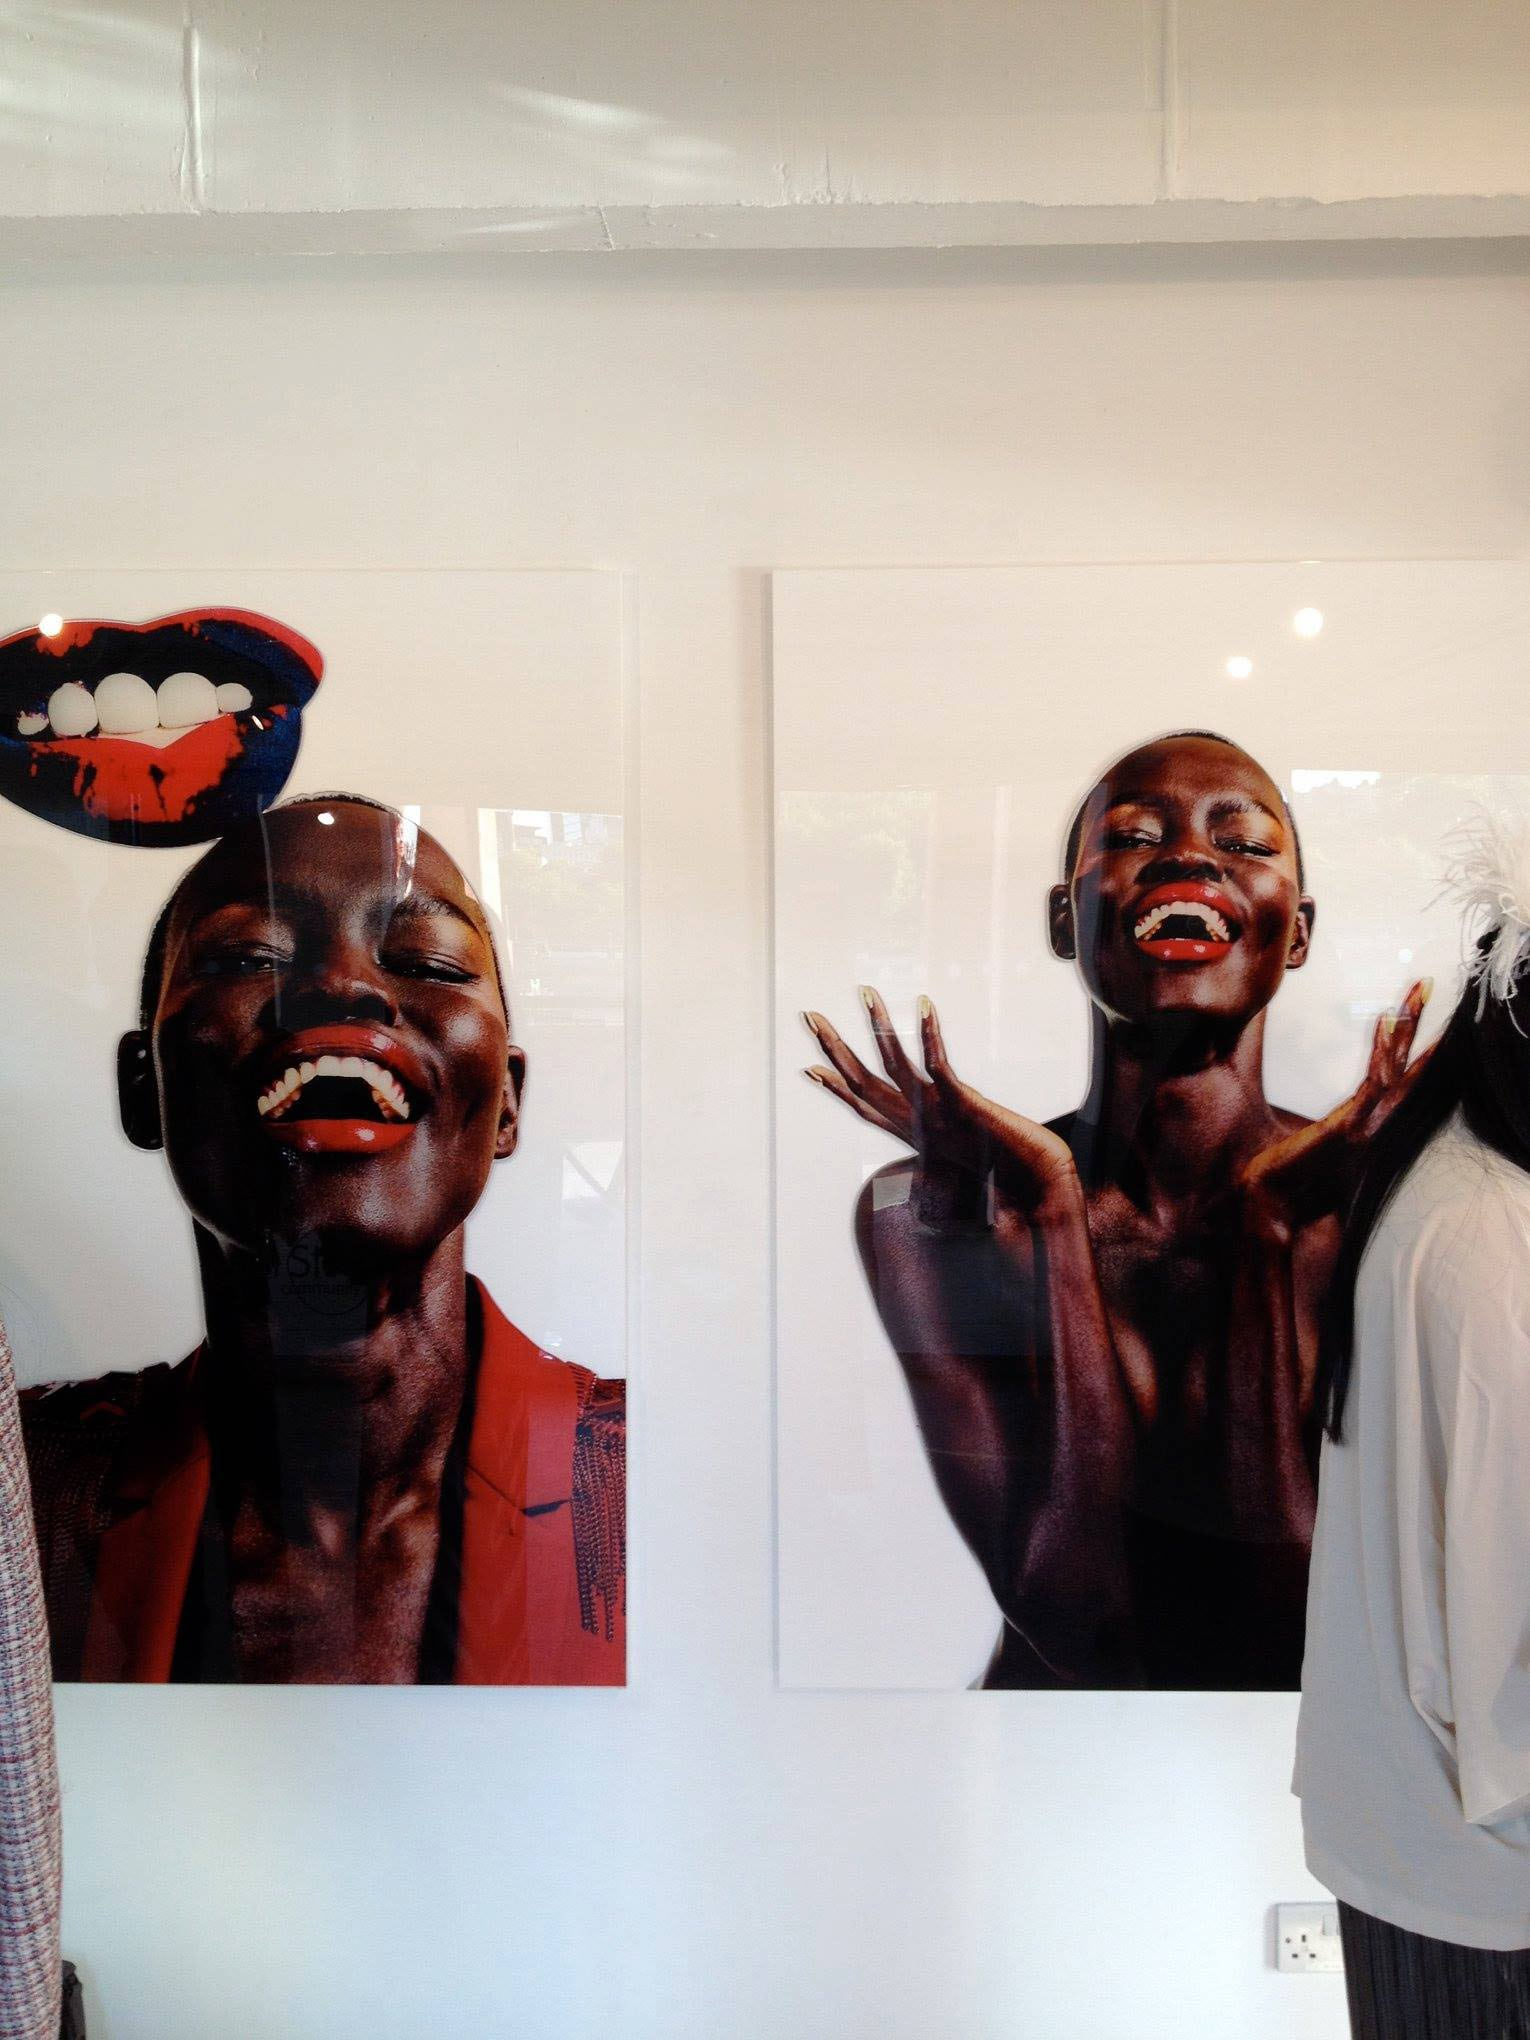 AUB BA (Hons) Commercial Photography lecturer opens London exhibition